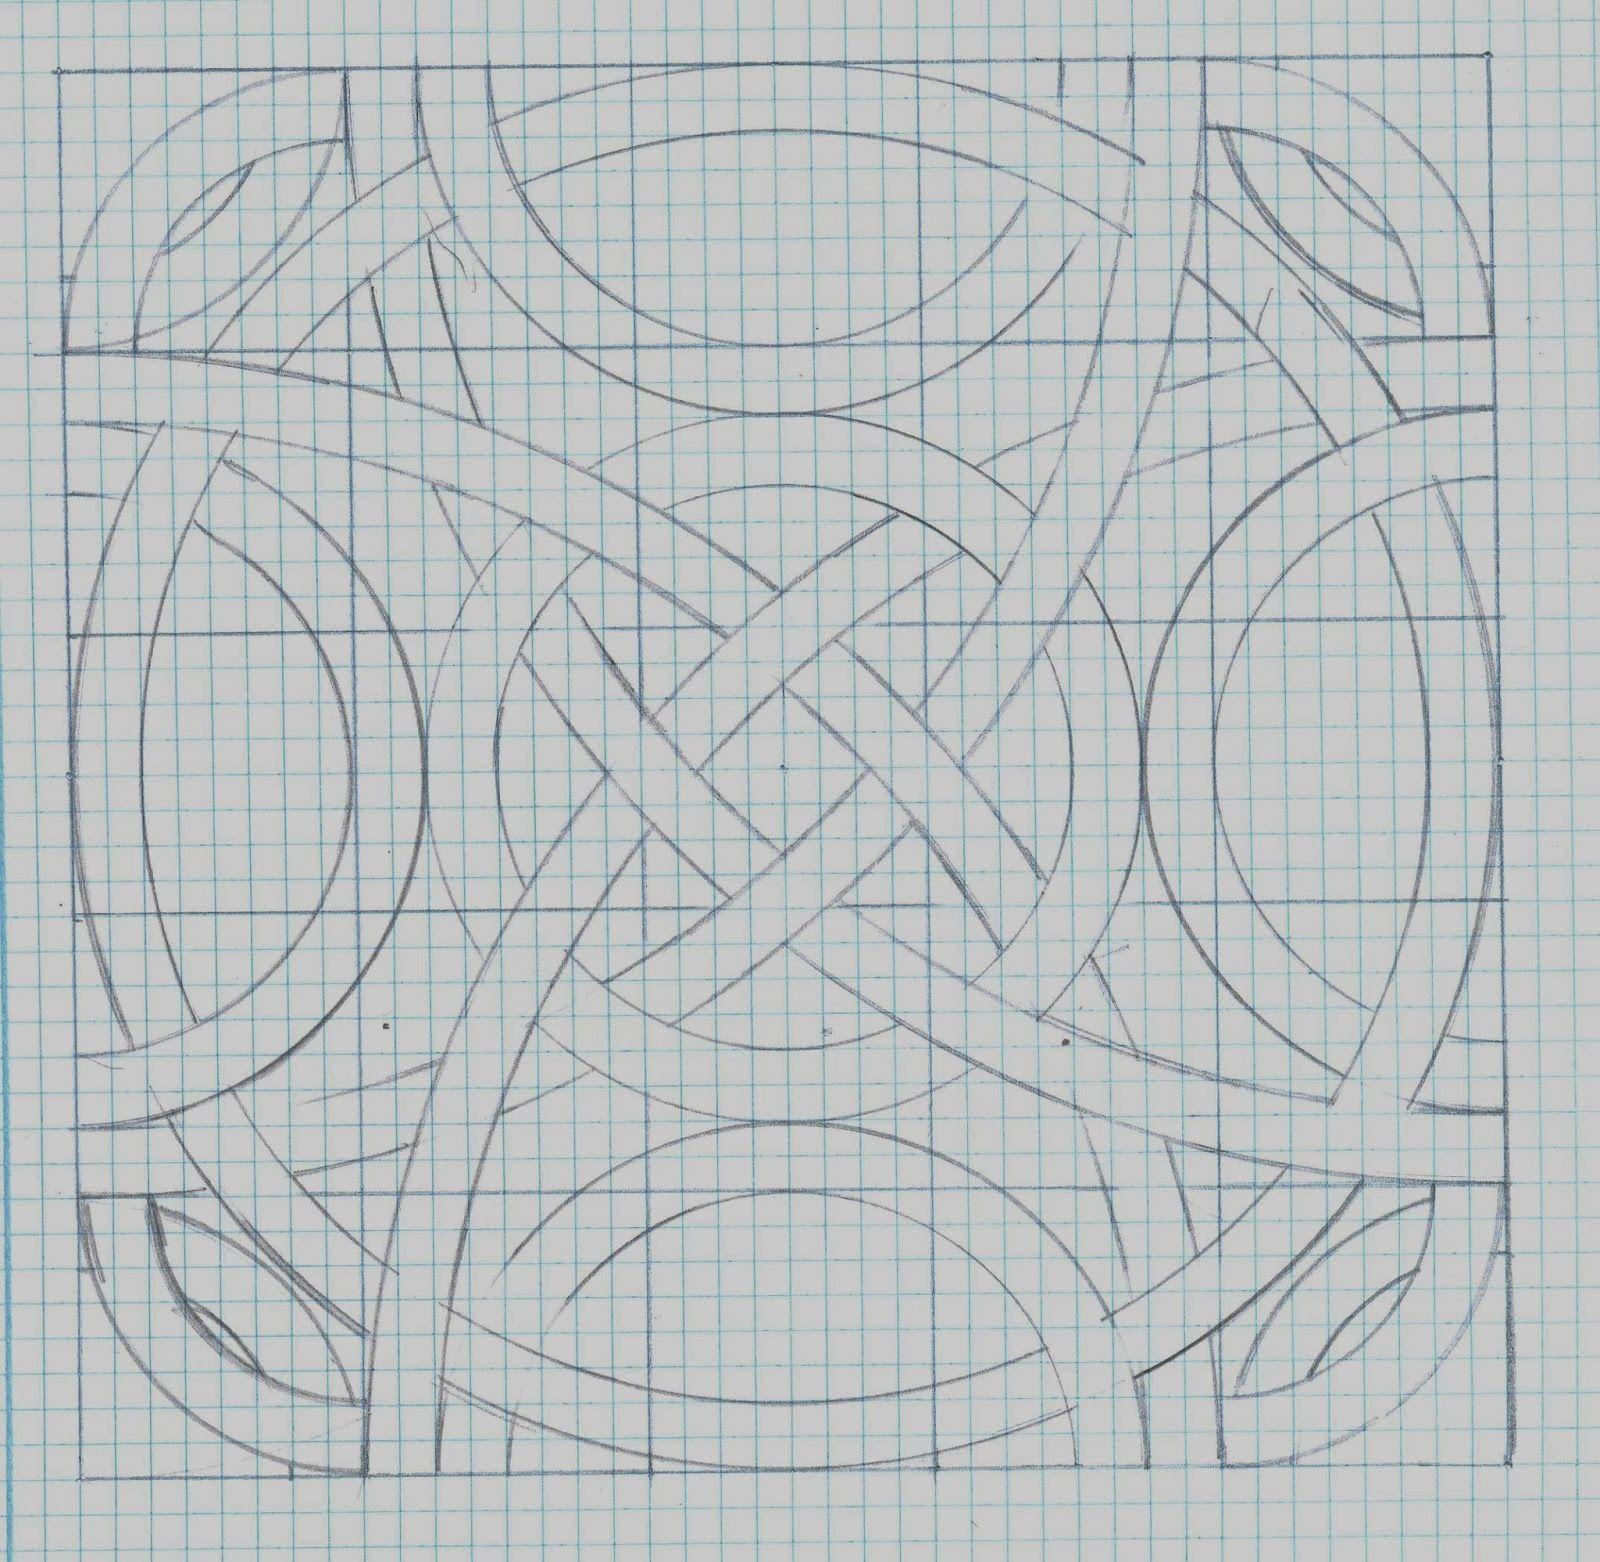 crear dibujo nudo celta en t - Google Search | doodles | Pinterest ...